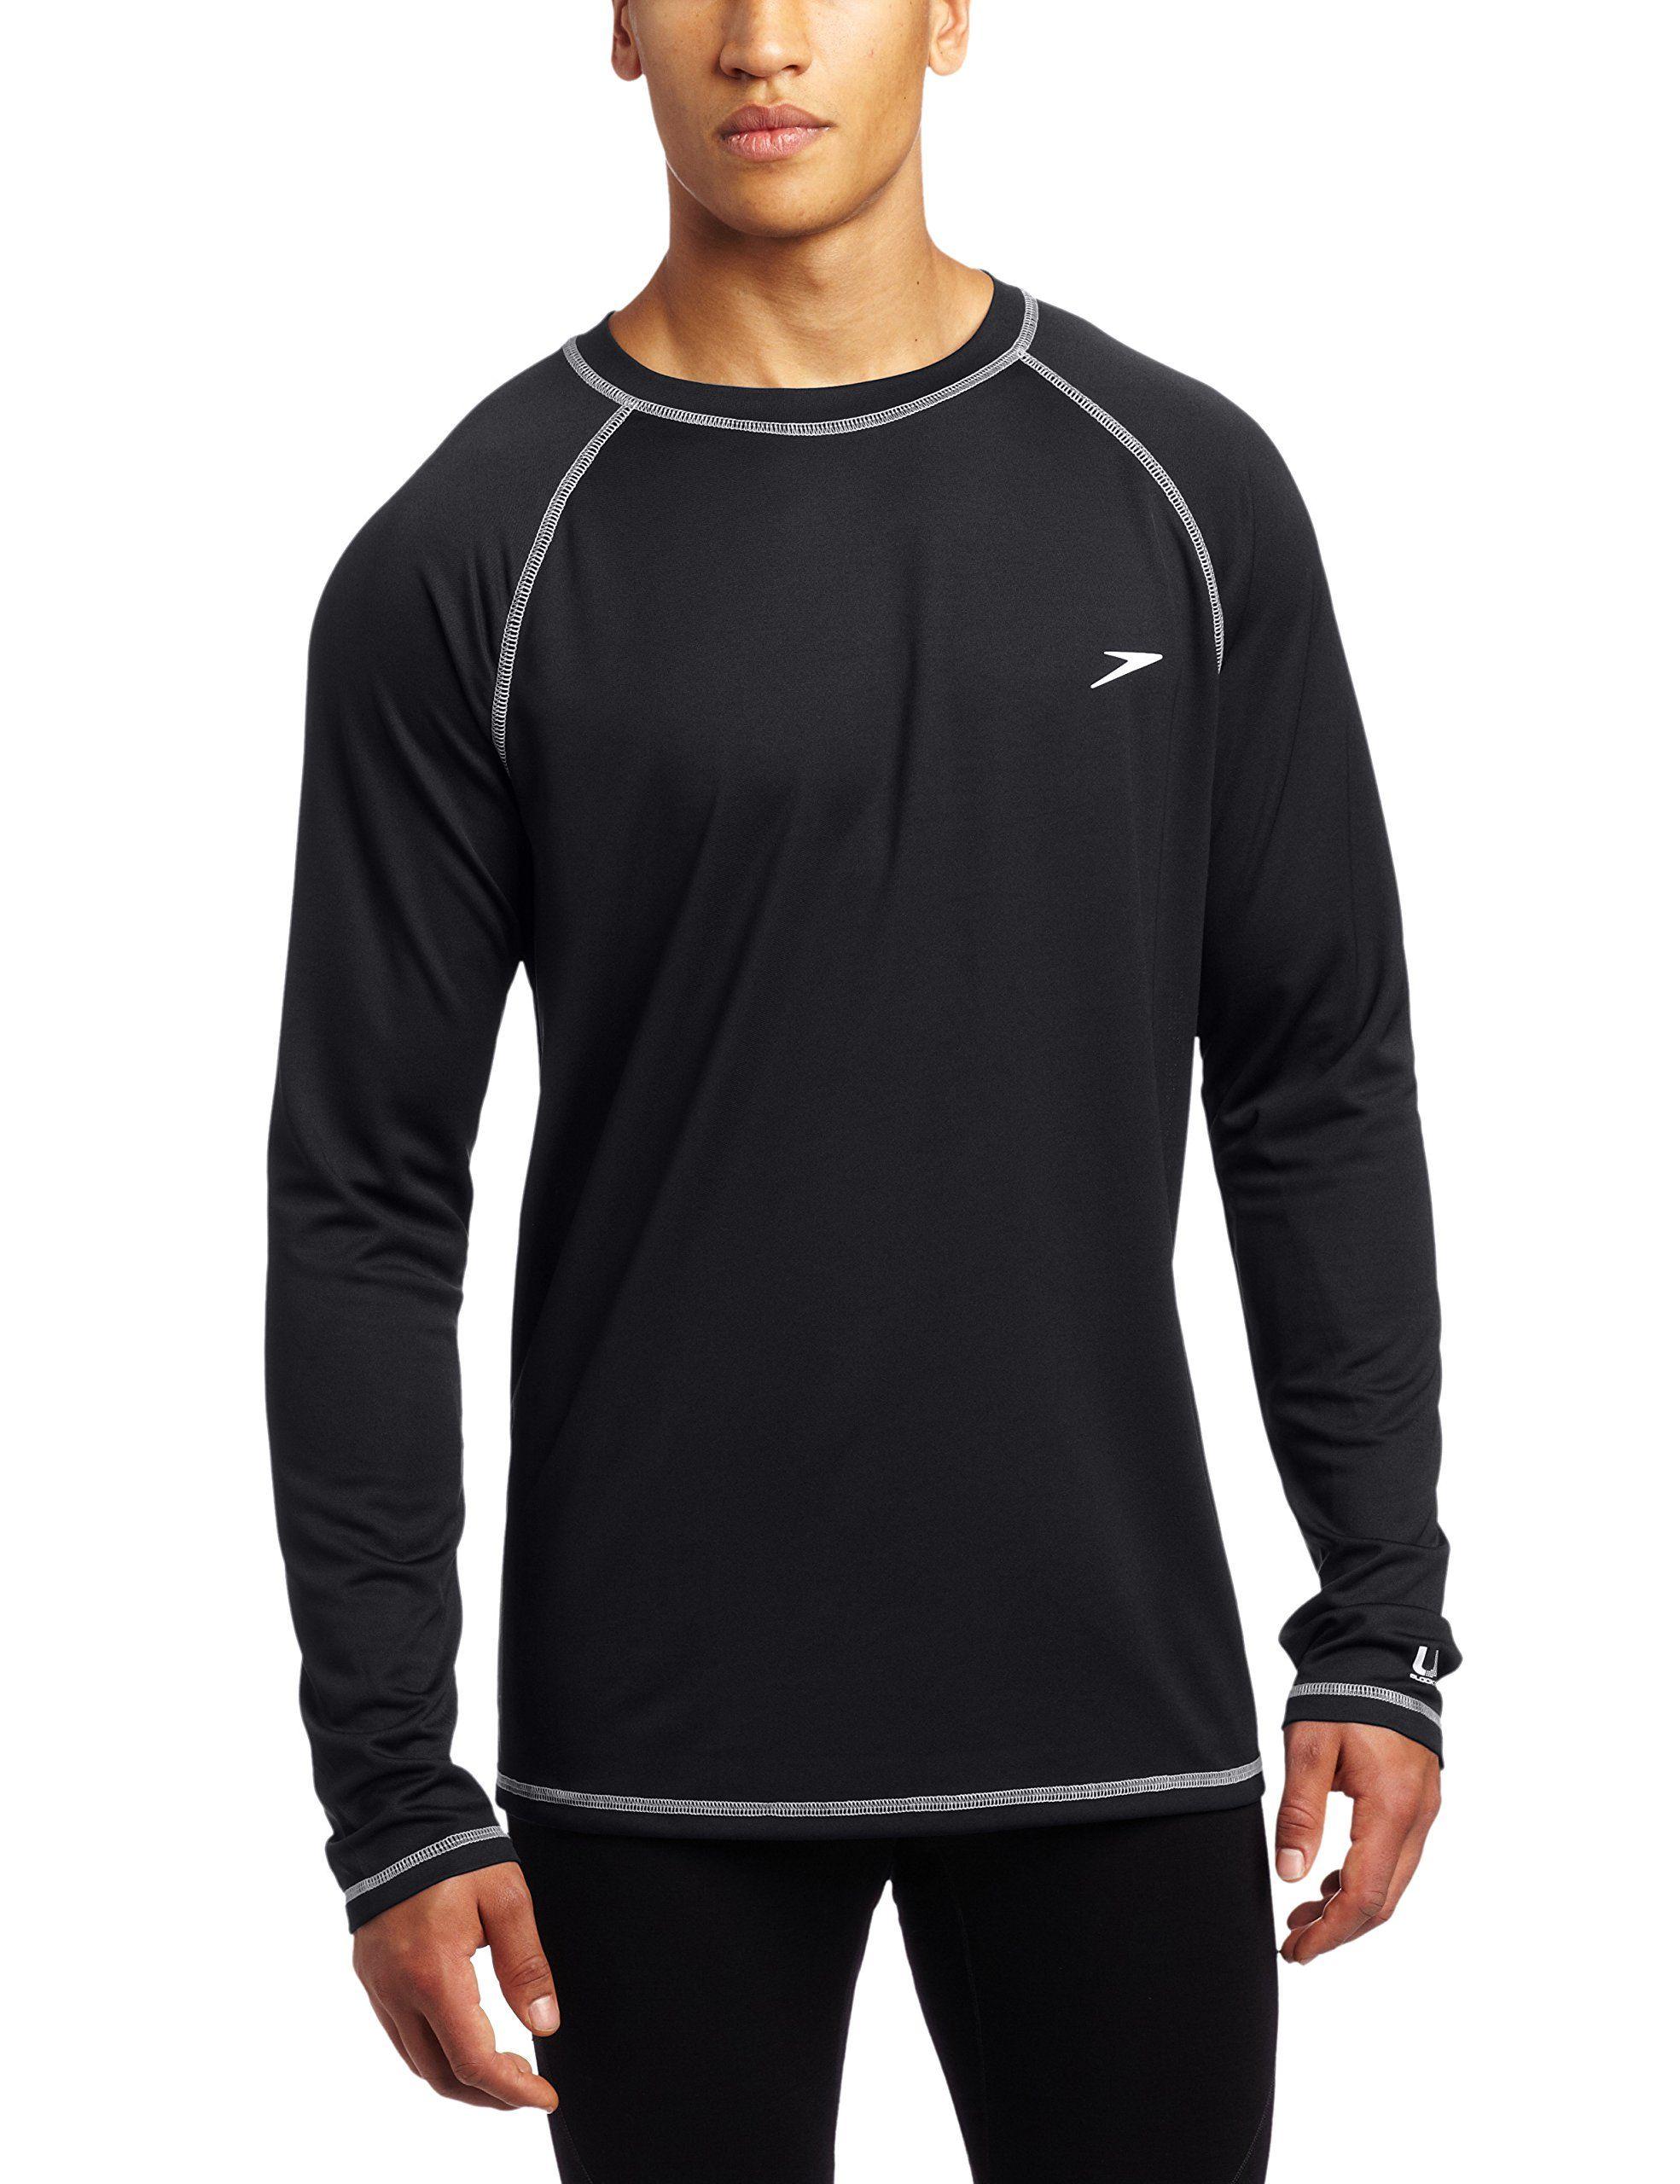 5a809a7dfb Speedo Men's UPF 50+ Easy Long Sleeve Rashguard Swim Tee,Black,X ...